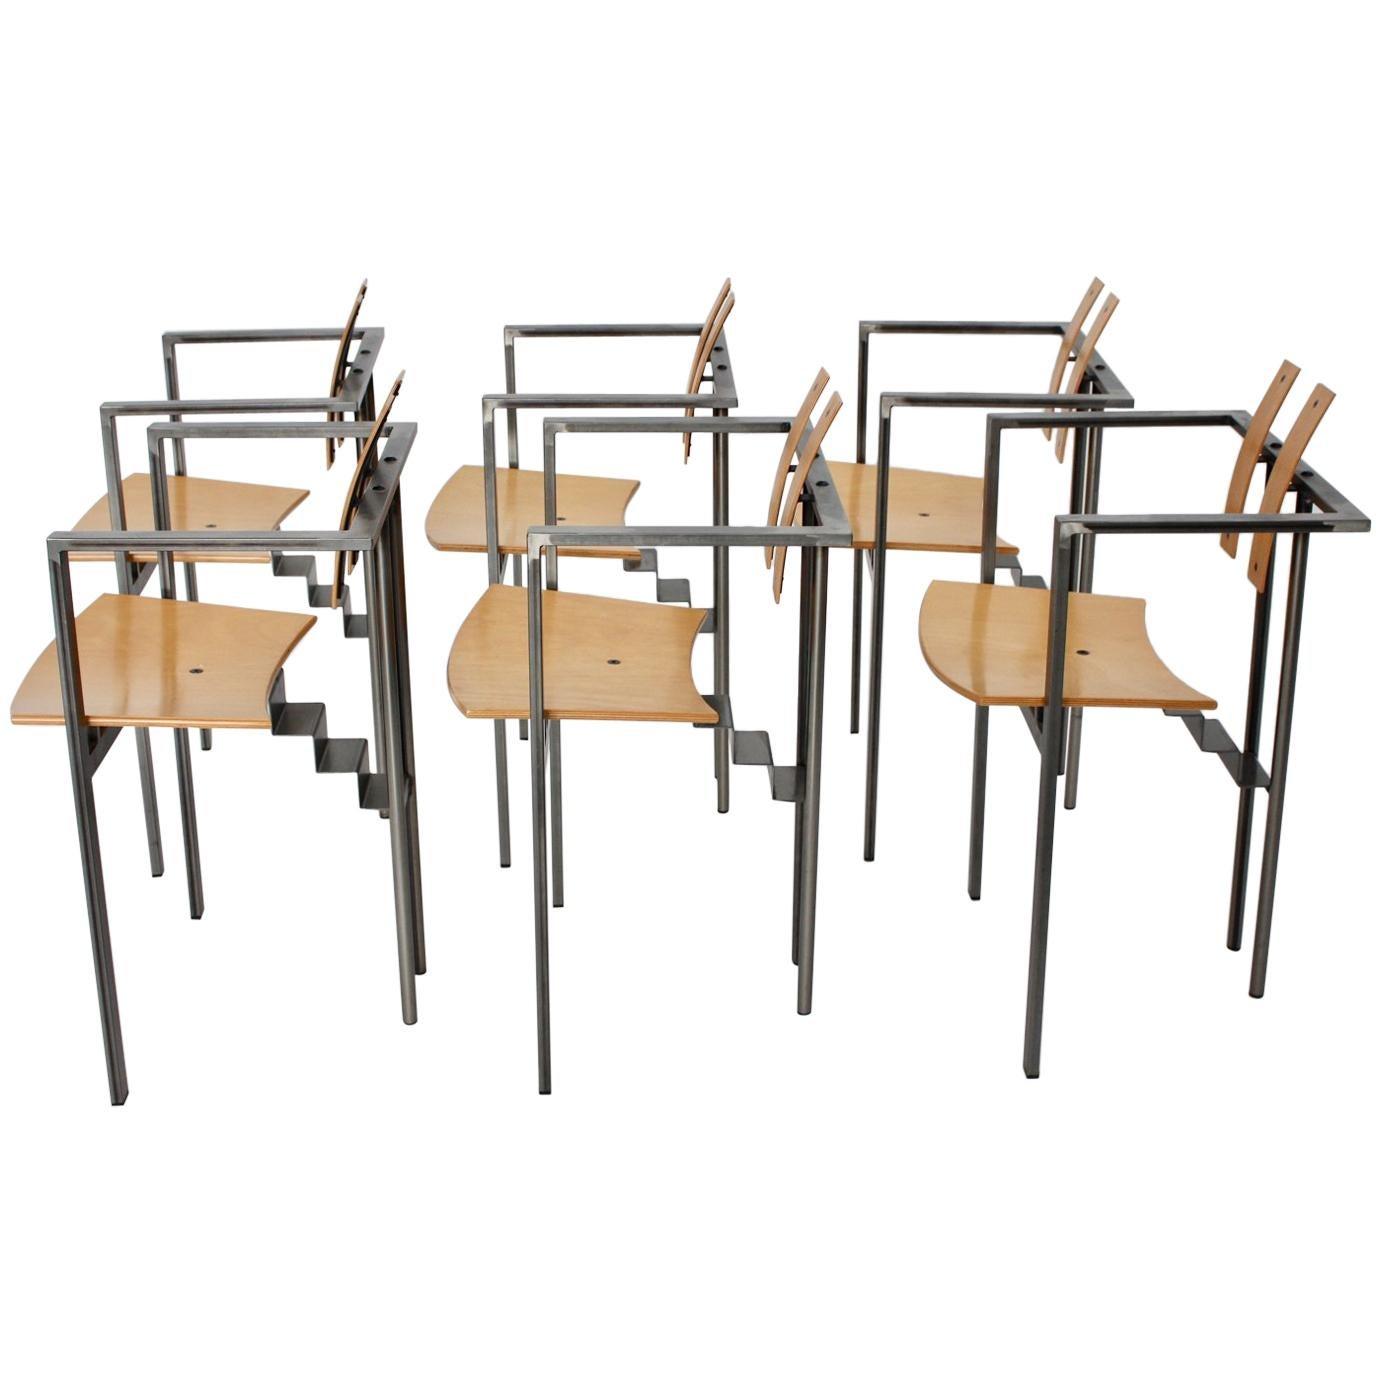 Postmodern Vintage Metal Beech Dining Chairs Set of Six, circa 1980, Italy